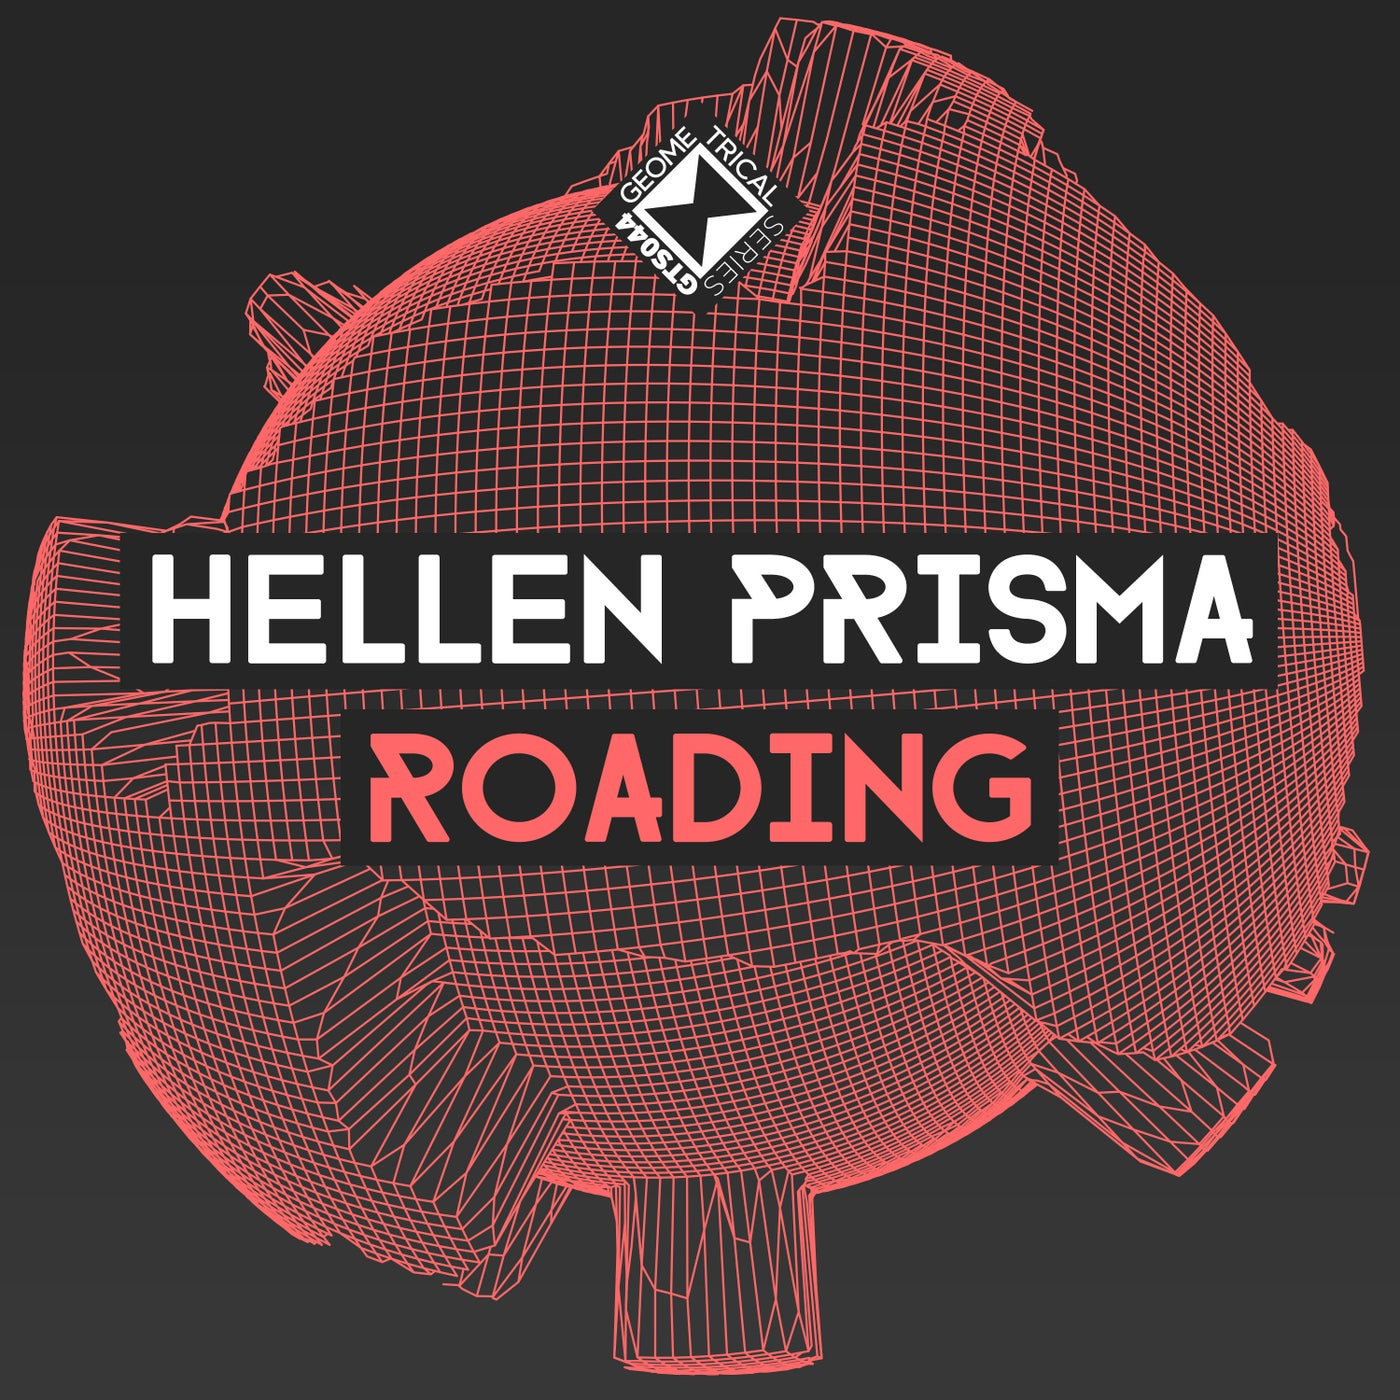 Roading (Original Mix)